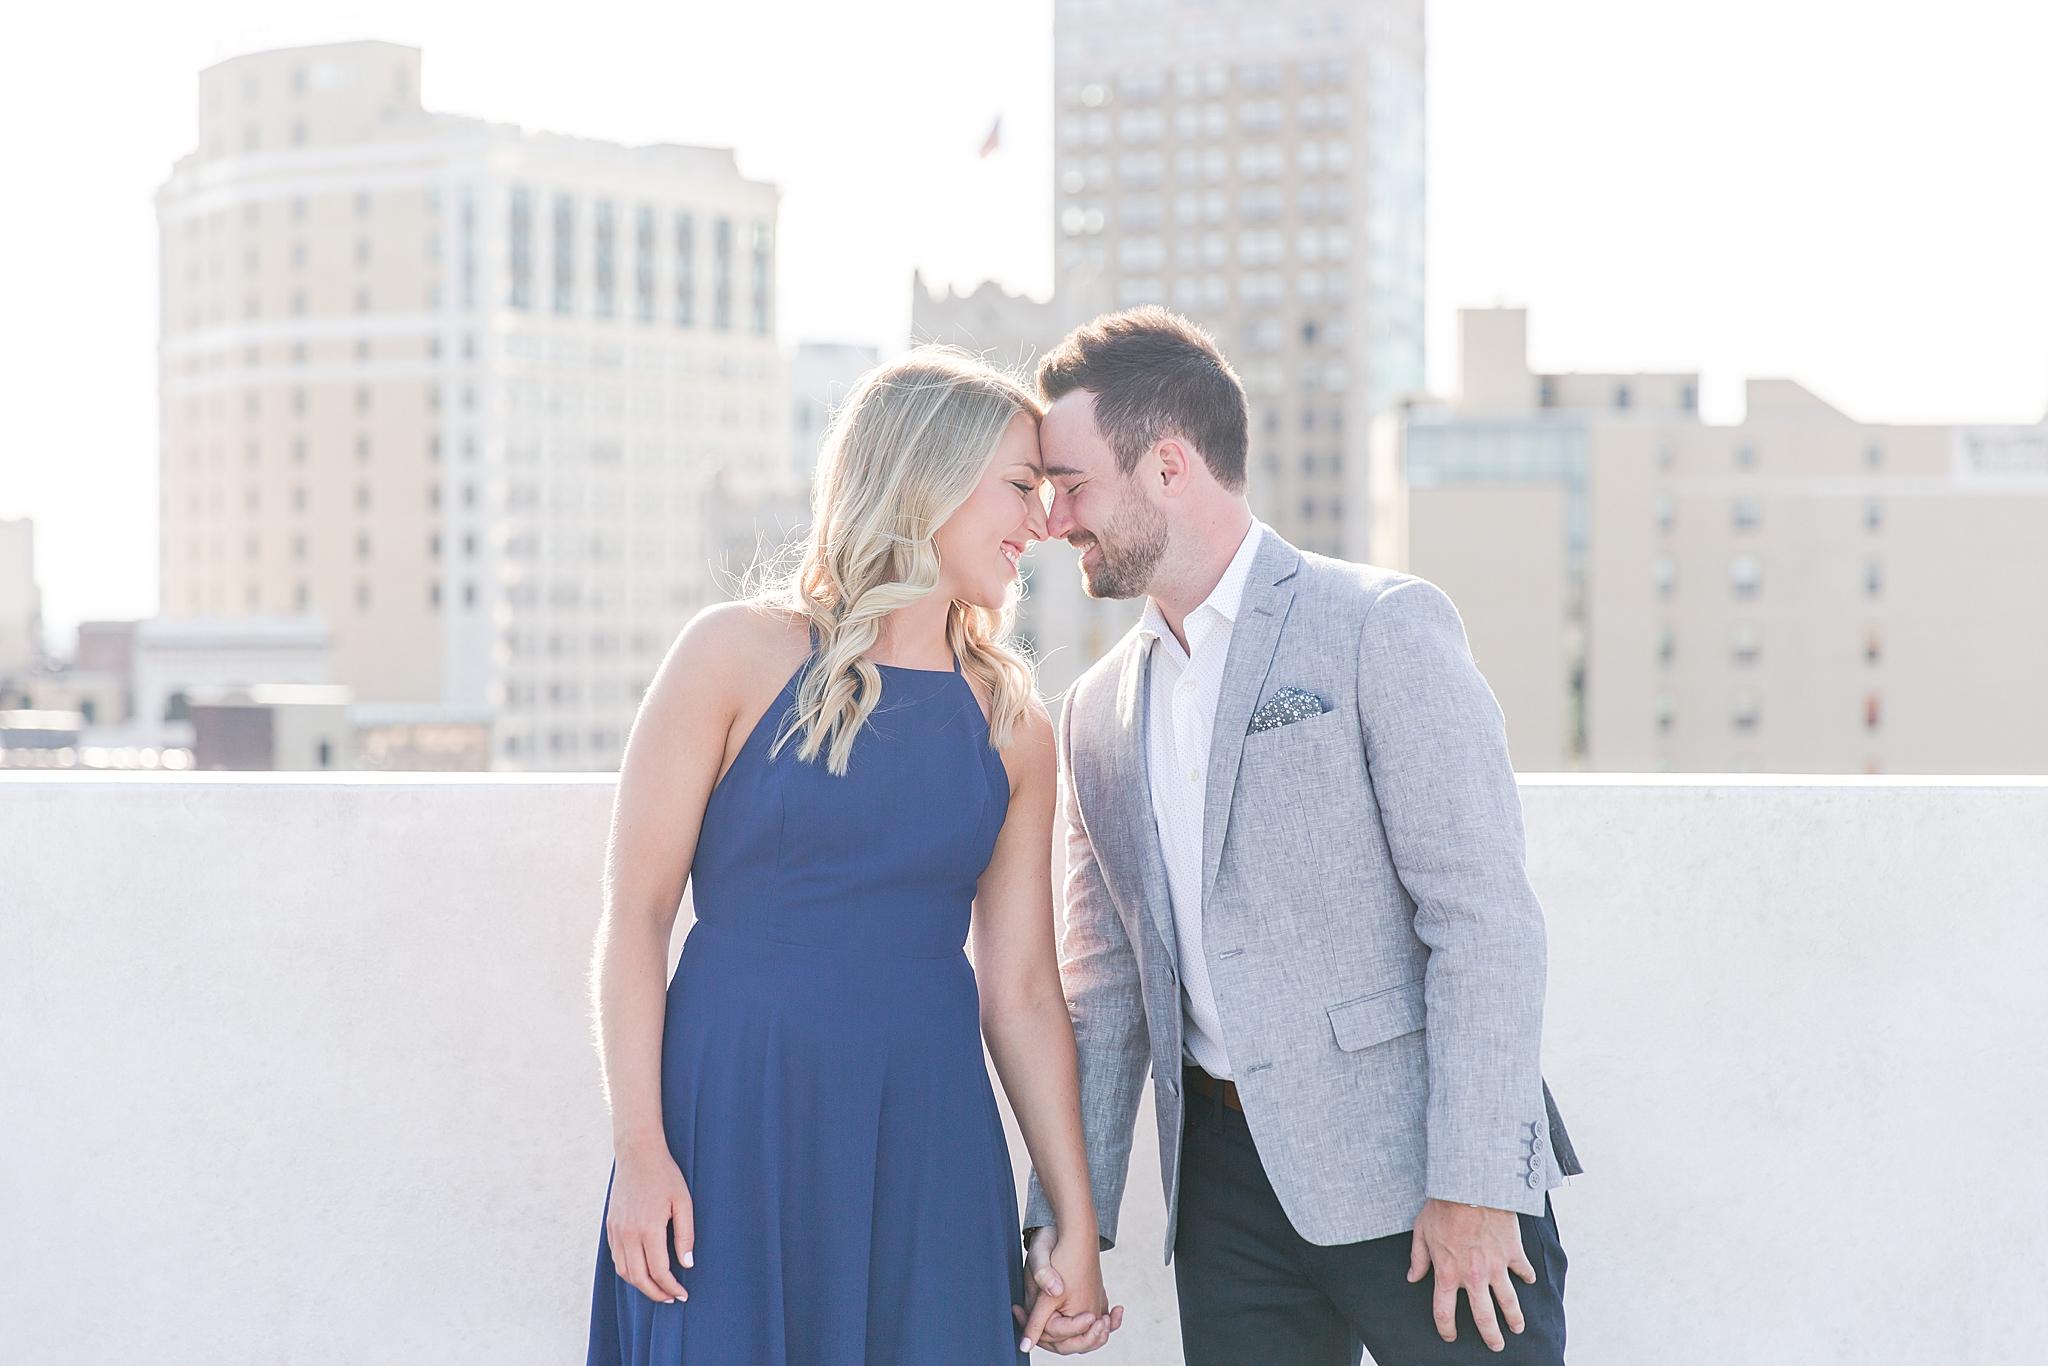 detroit-wedding-photographer-downtown-detroit-belle-isle-engagement-photos-sarah-eric-by-courtney-carolyn-photography_0018.jpg